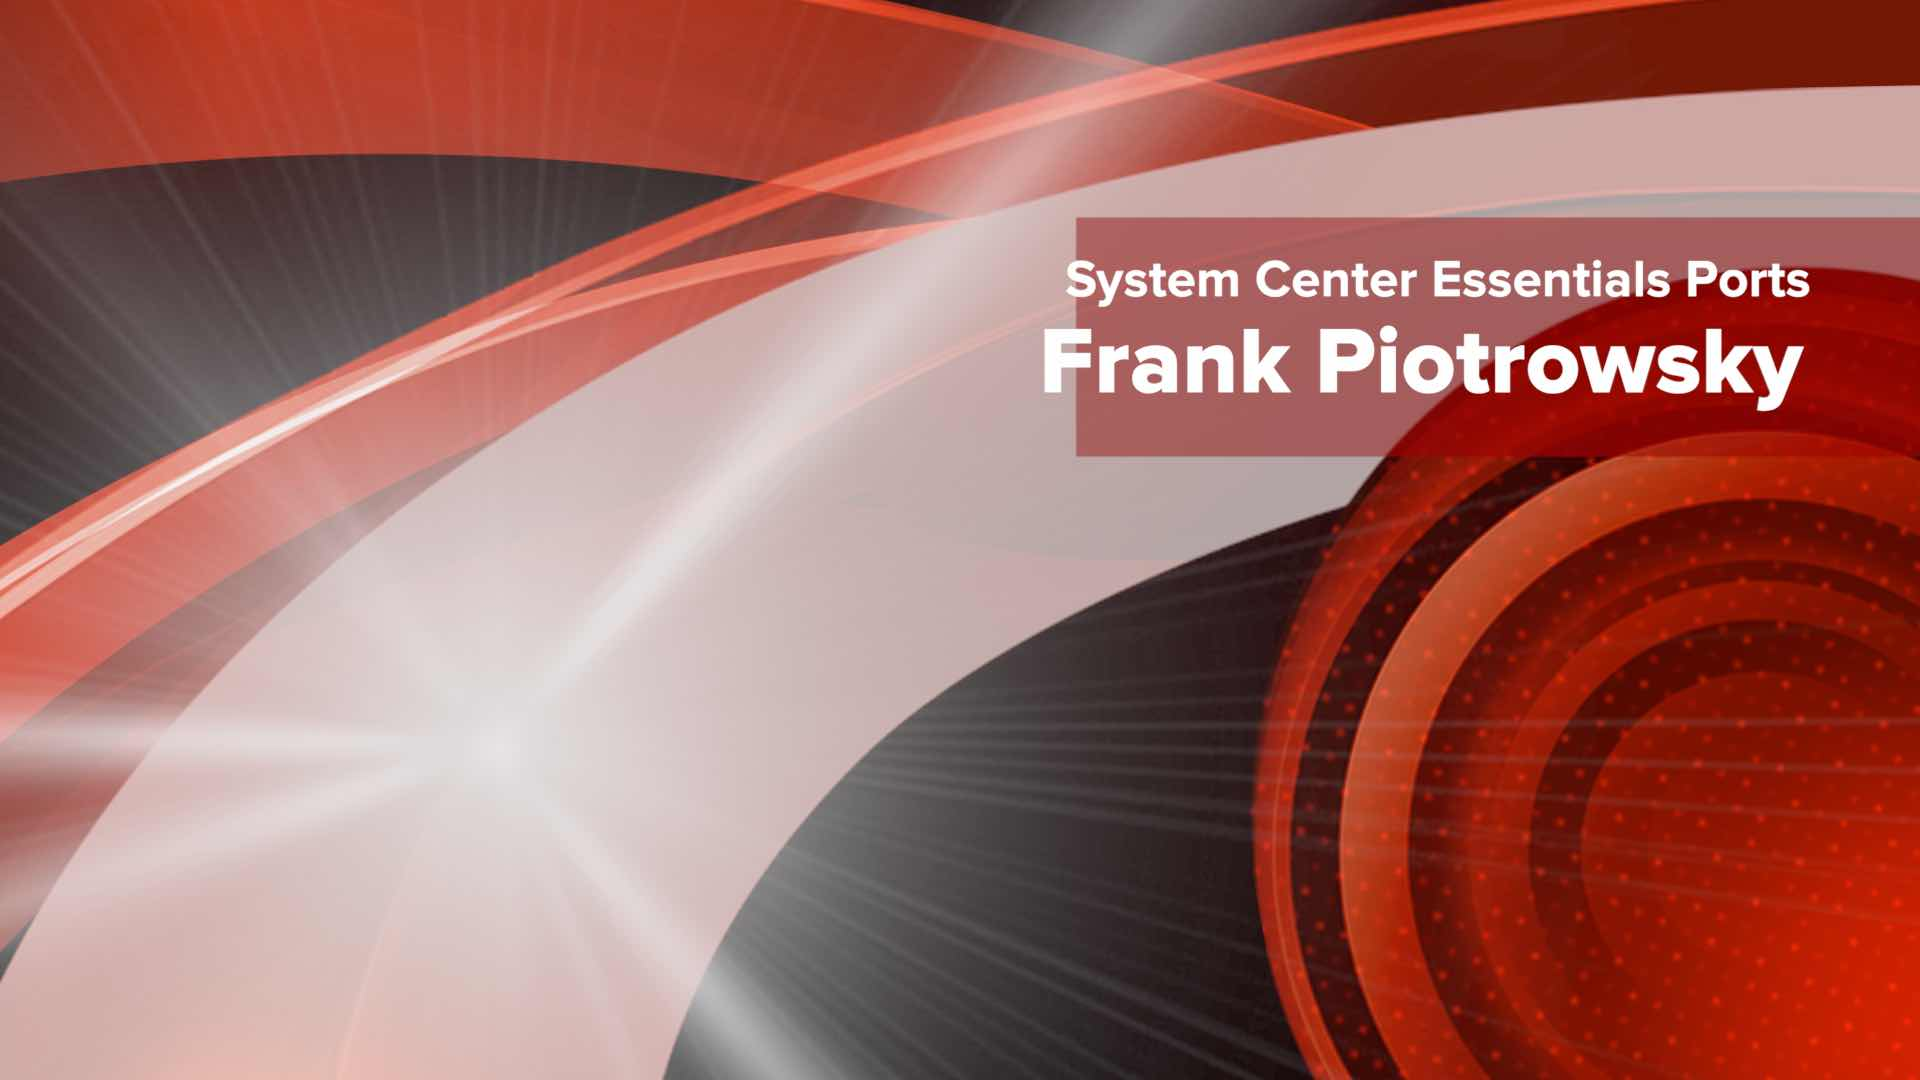 System Center Essentials Ports